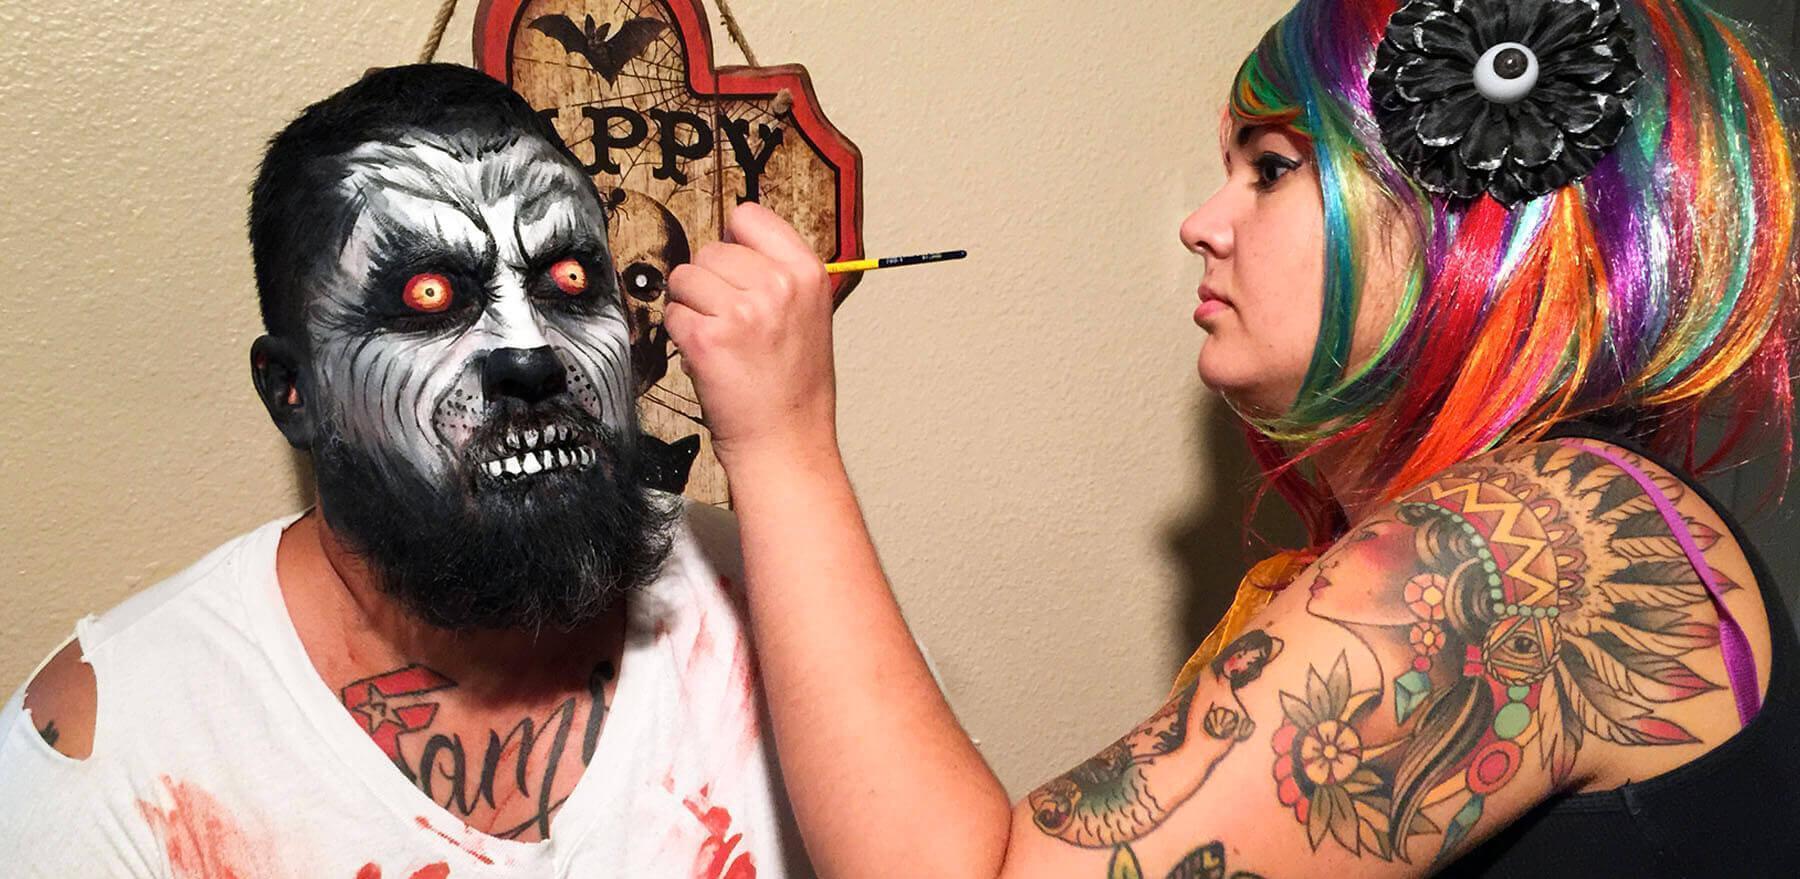 Deltona face painters